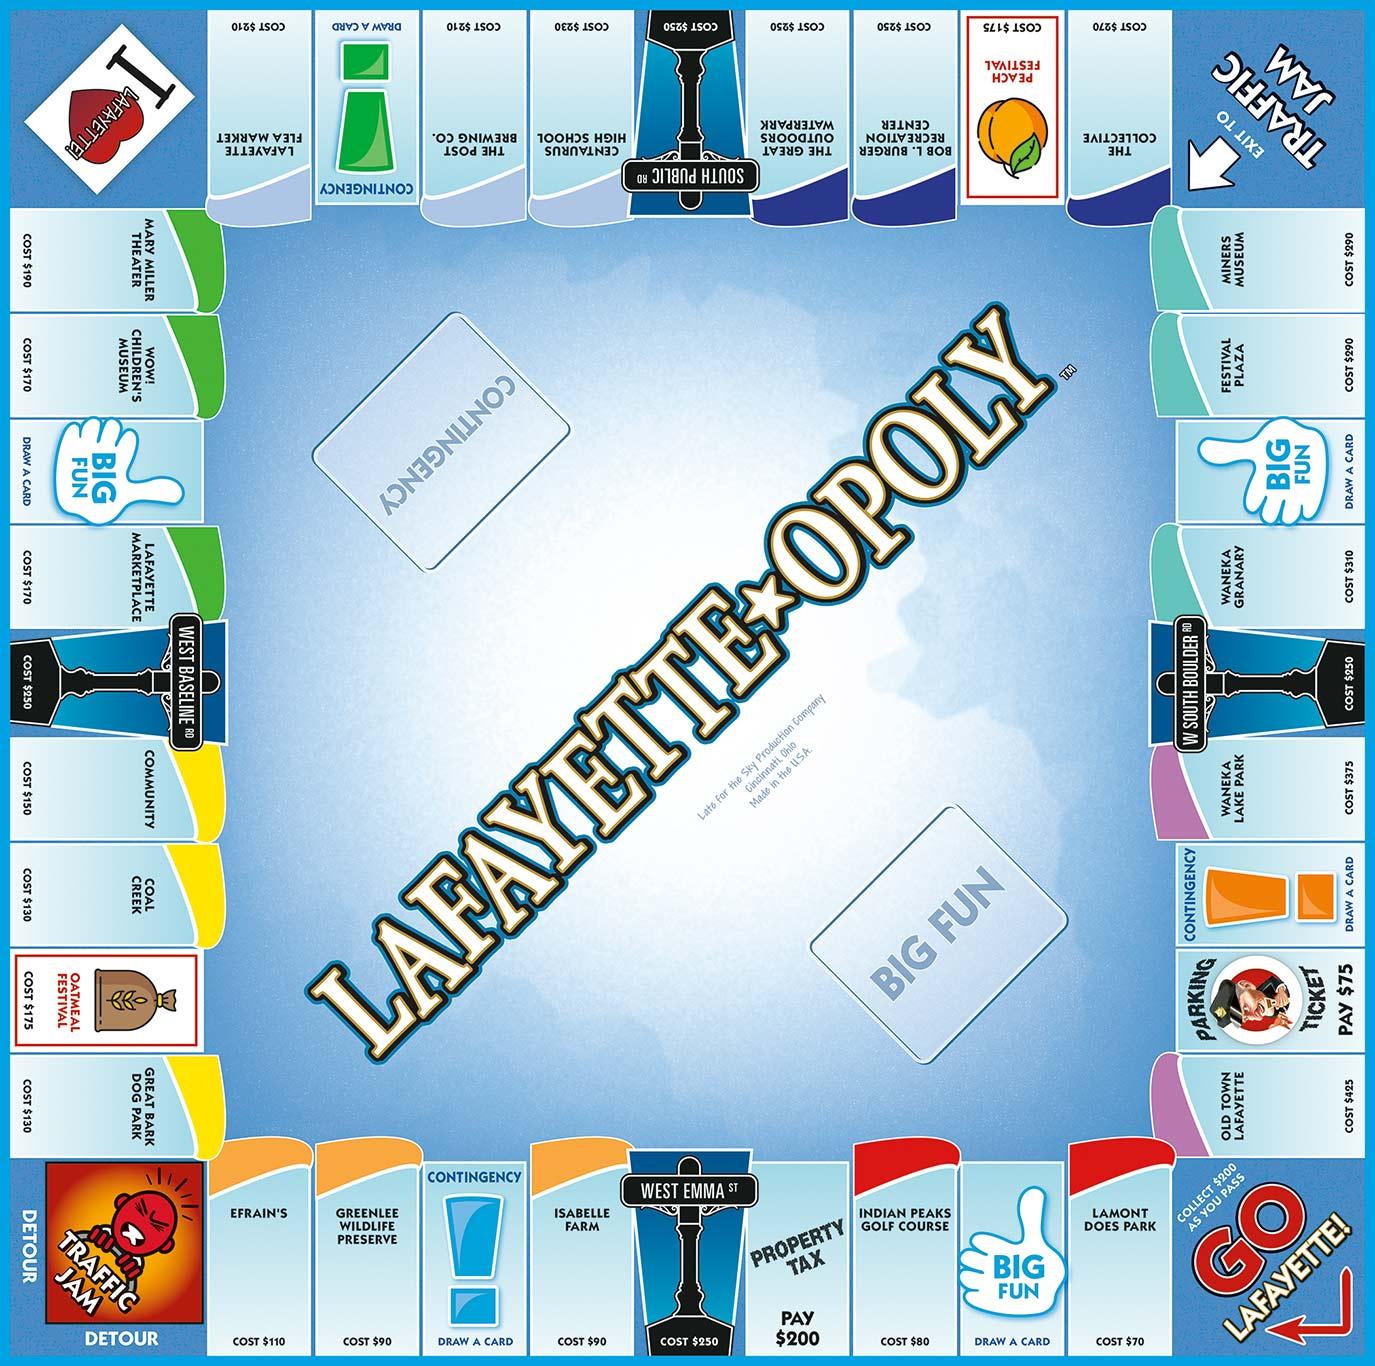 LAFAYETTE-OPOLY Board Game